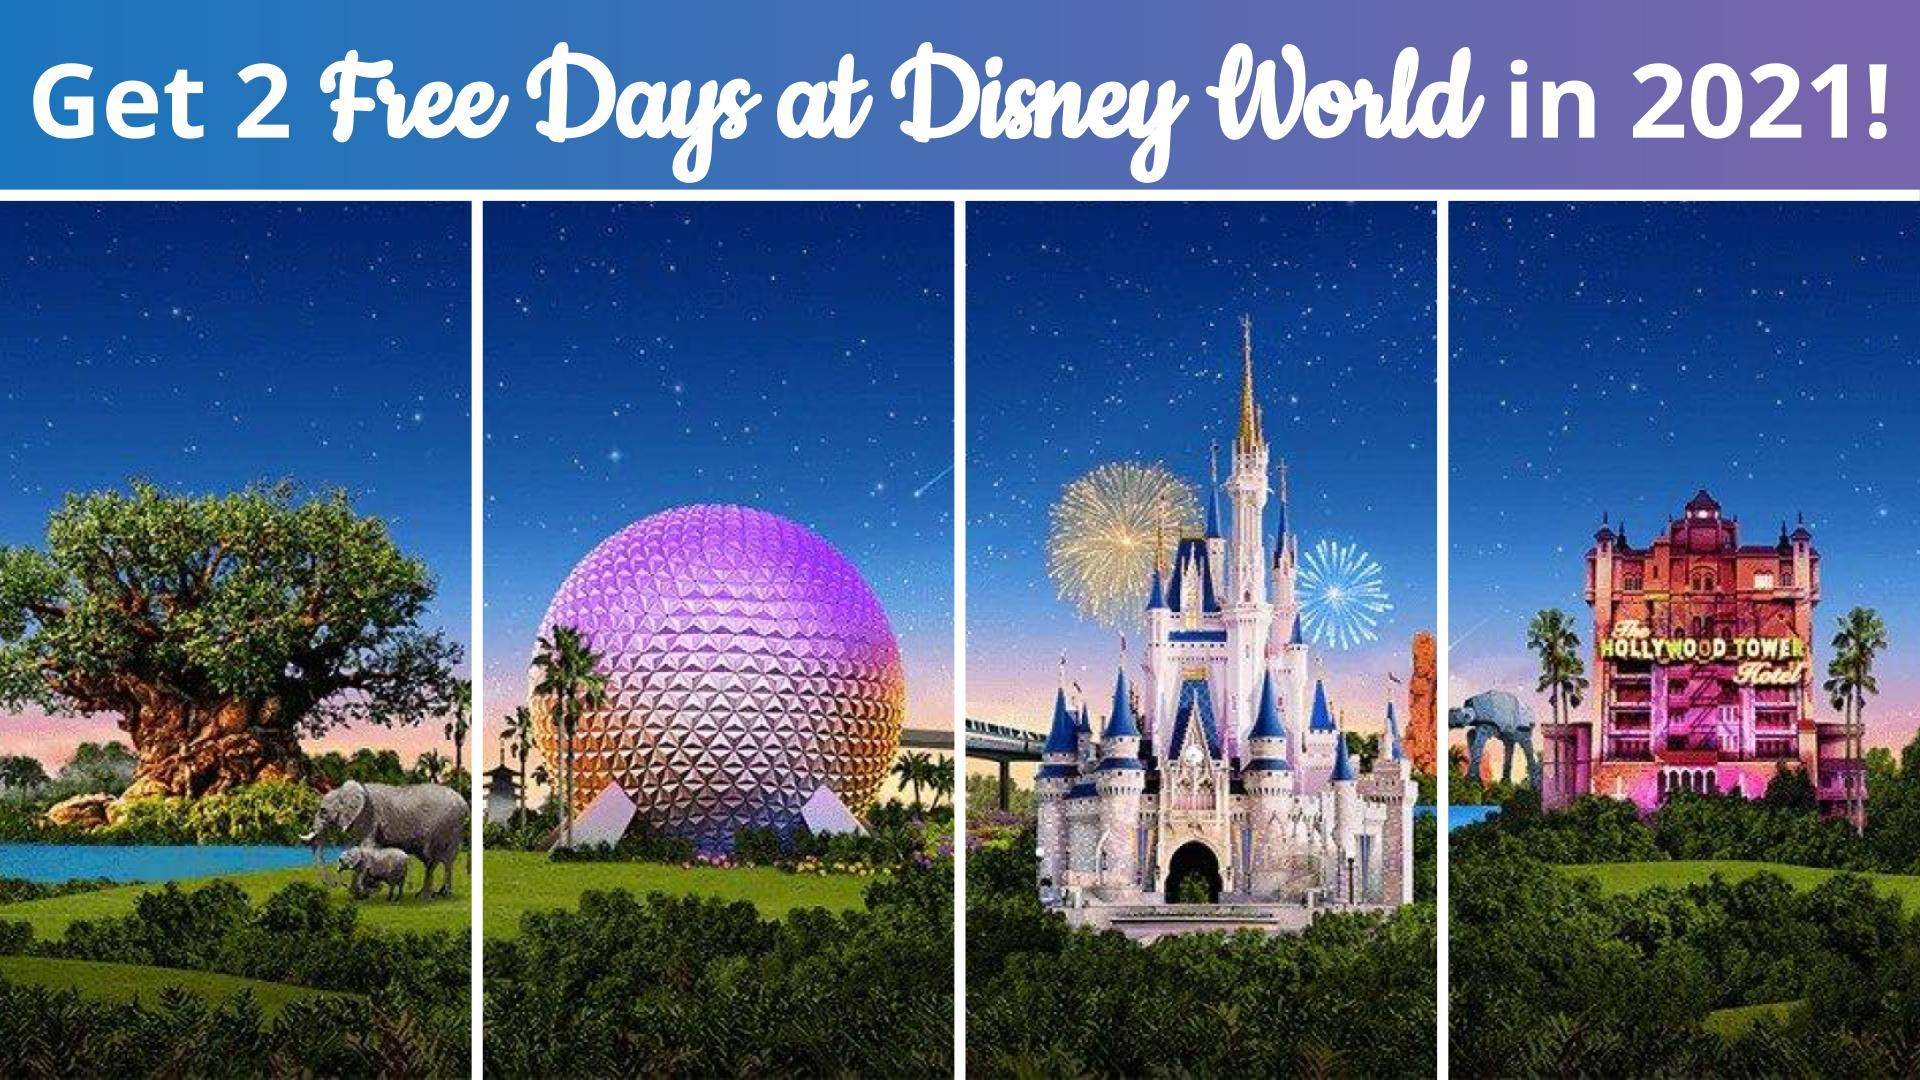 Get 2 Free Days at Disney World in 2021